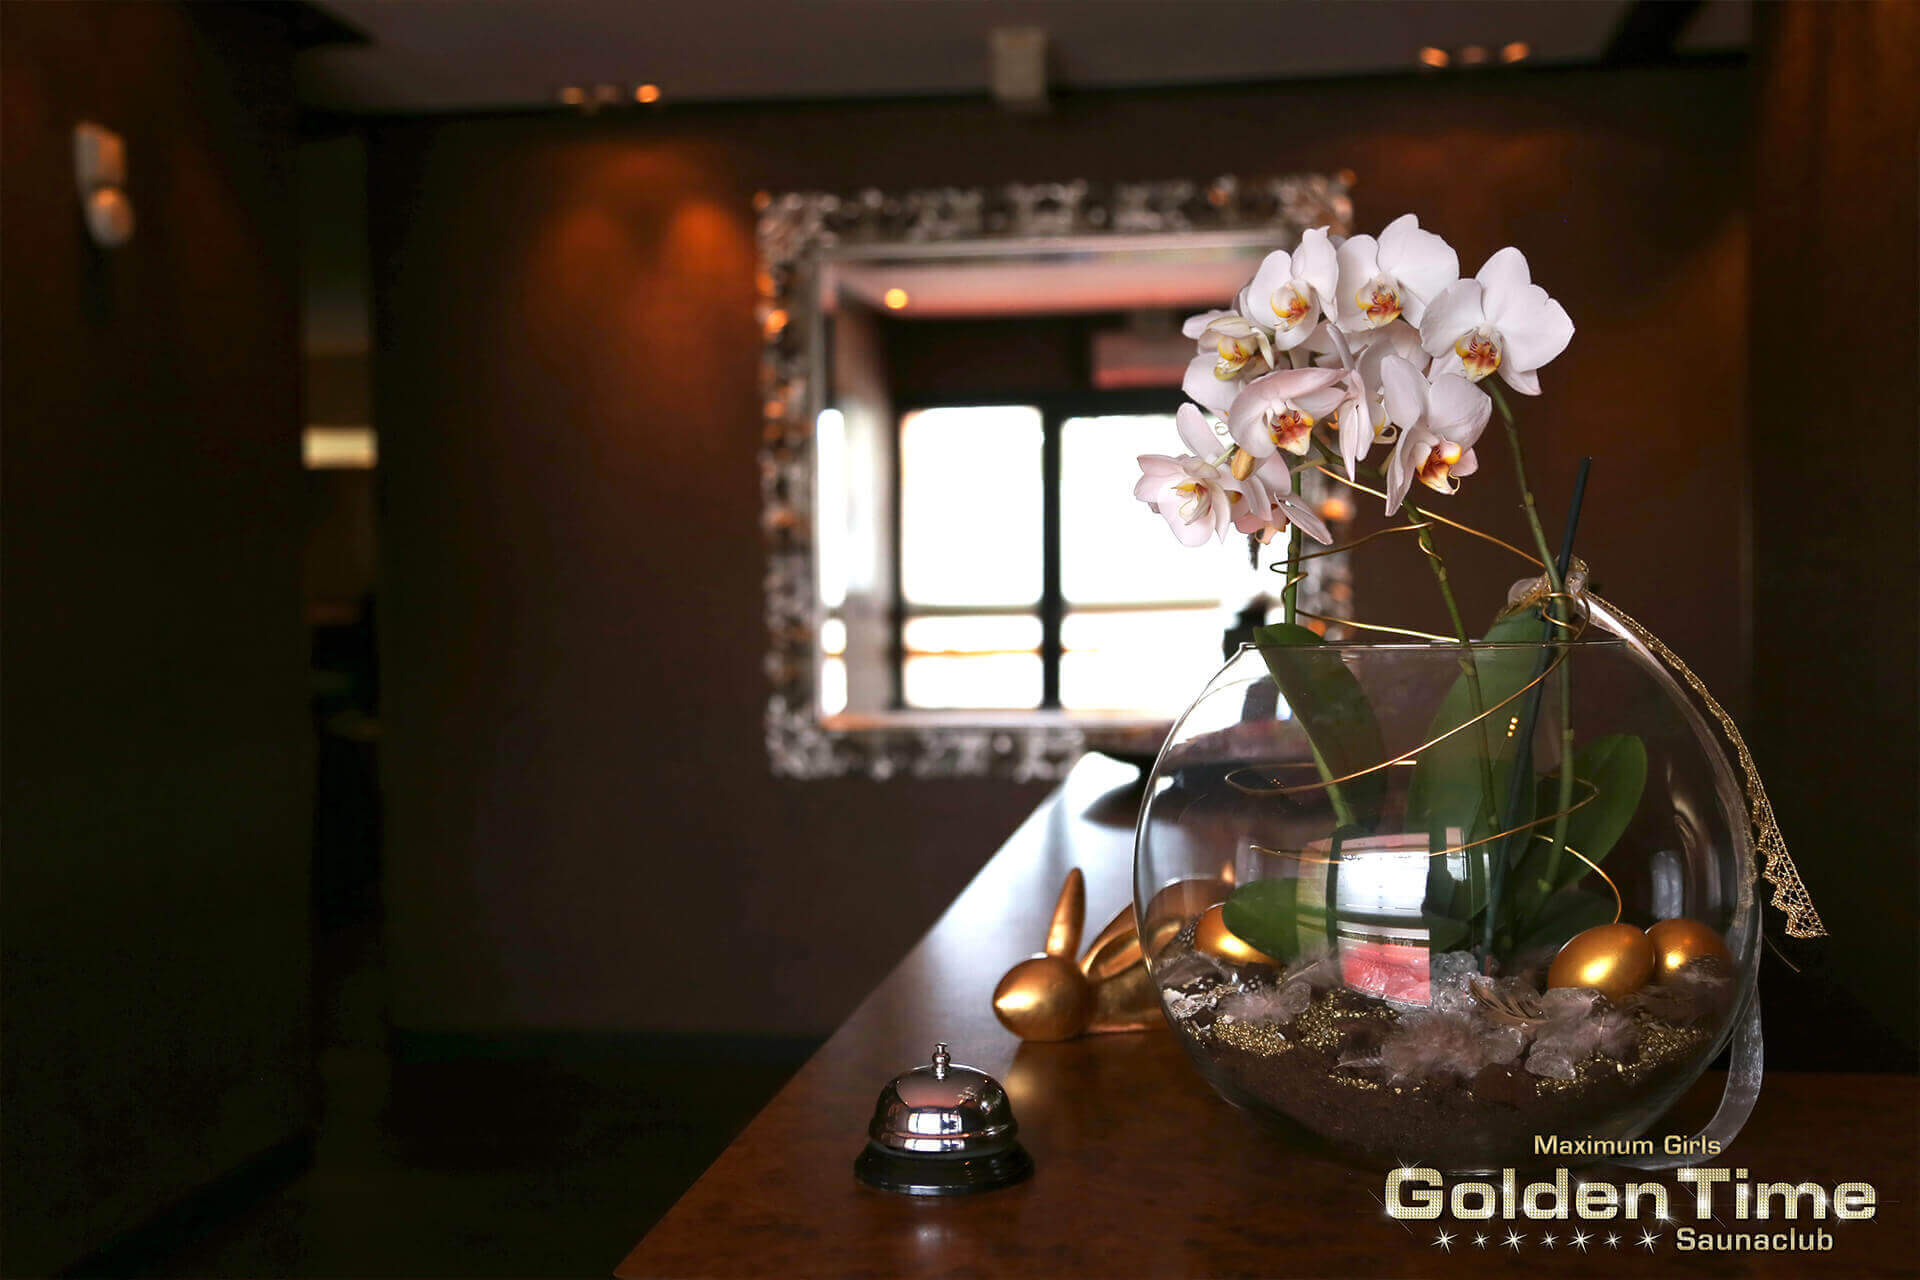 02-ostern-2016-pic-11-goldentime-saunaclub.jpg